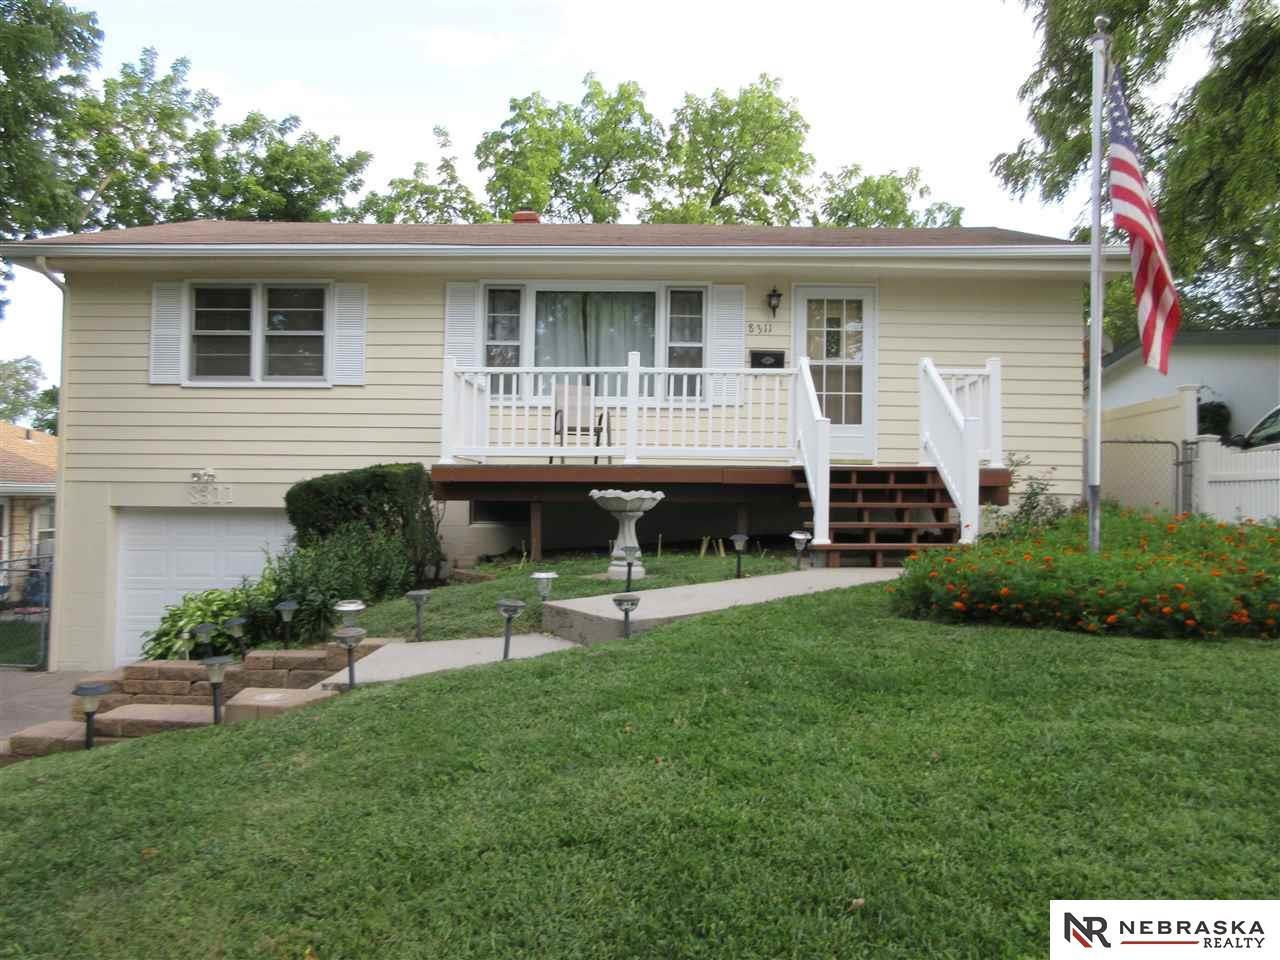 8311 Maywood Street, Ralston, NE 68127